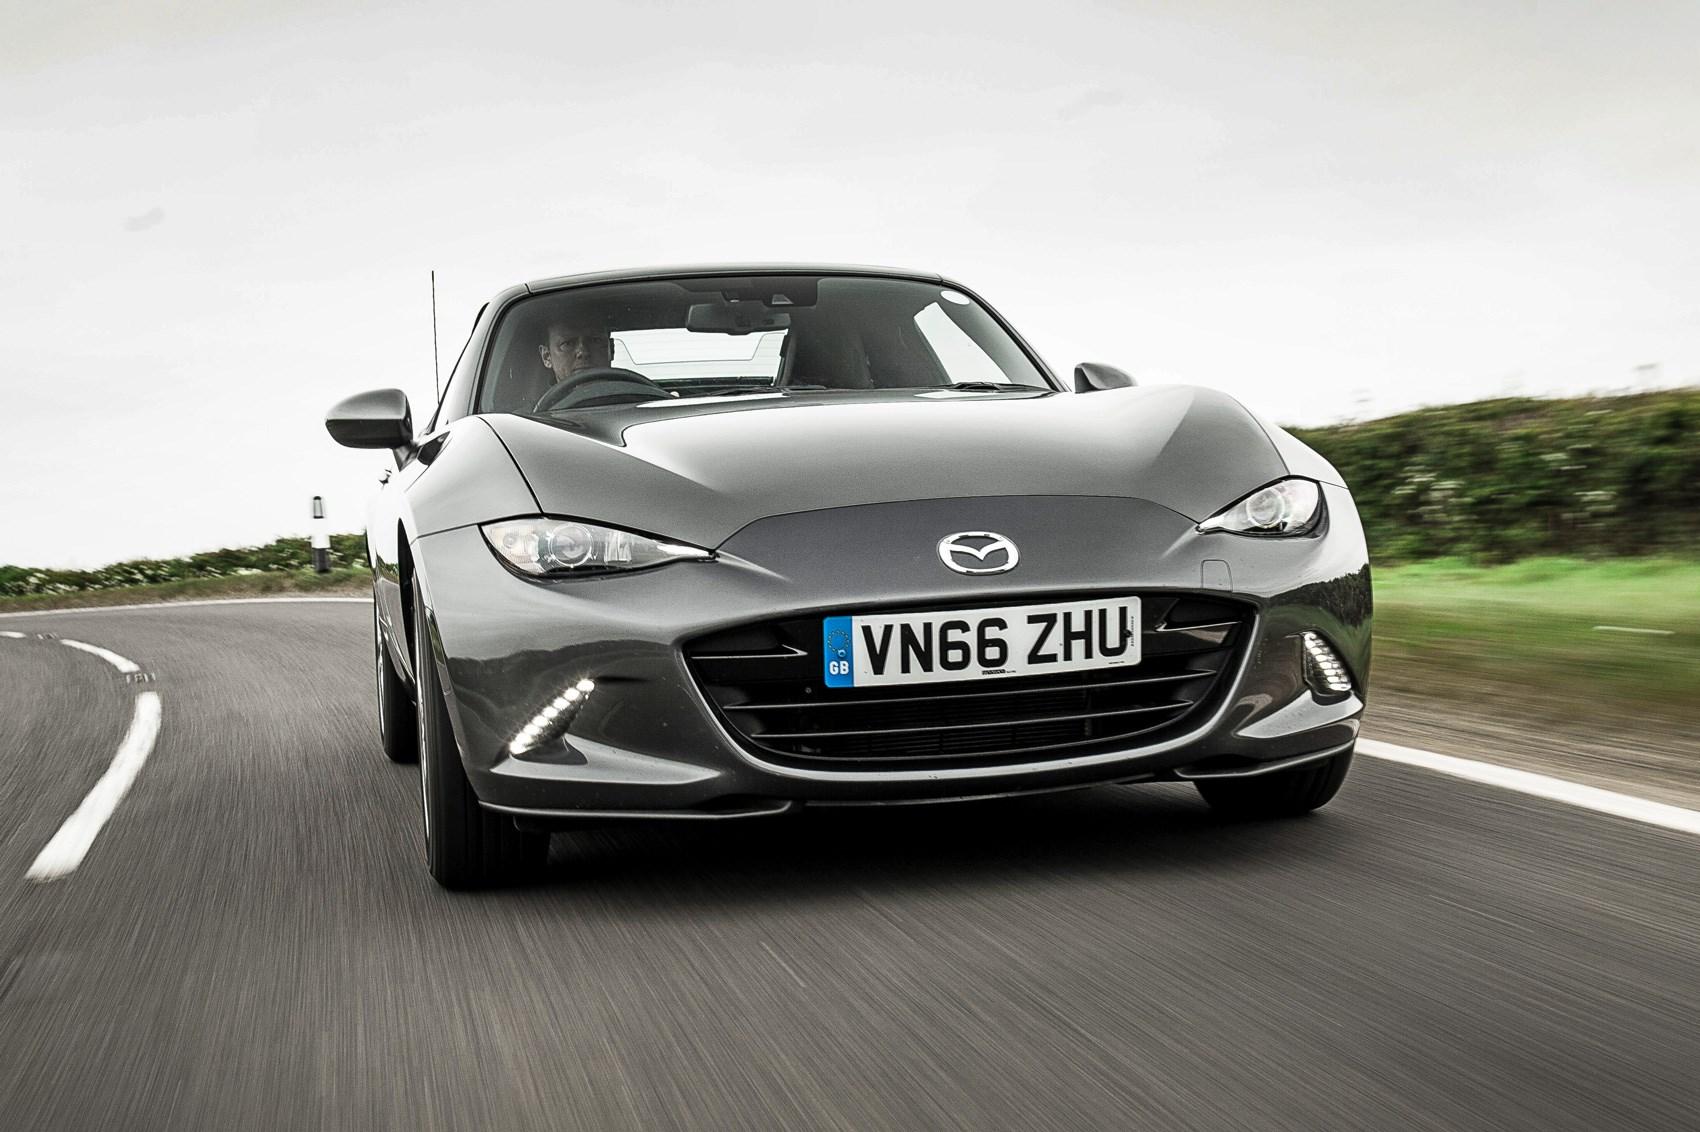 ... our Mazda MX-5 RF will drift